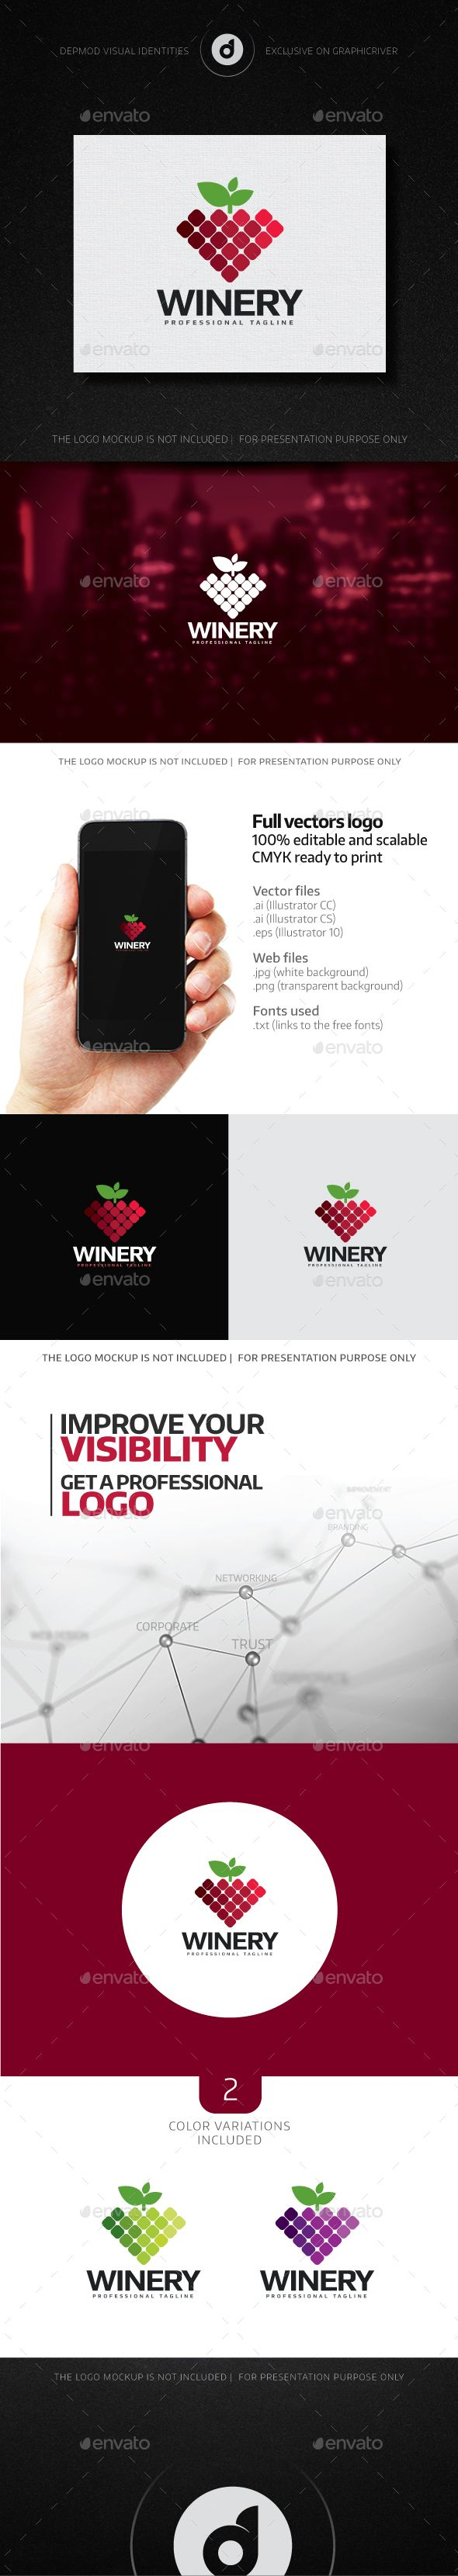 133 Best Food Drink Logos Images On Pinterest